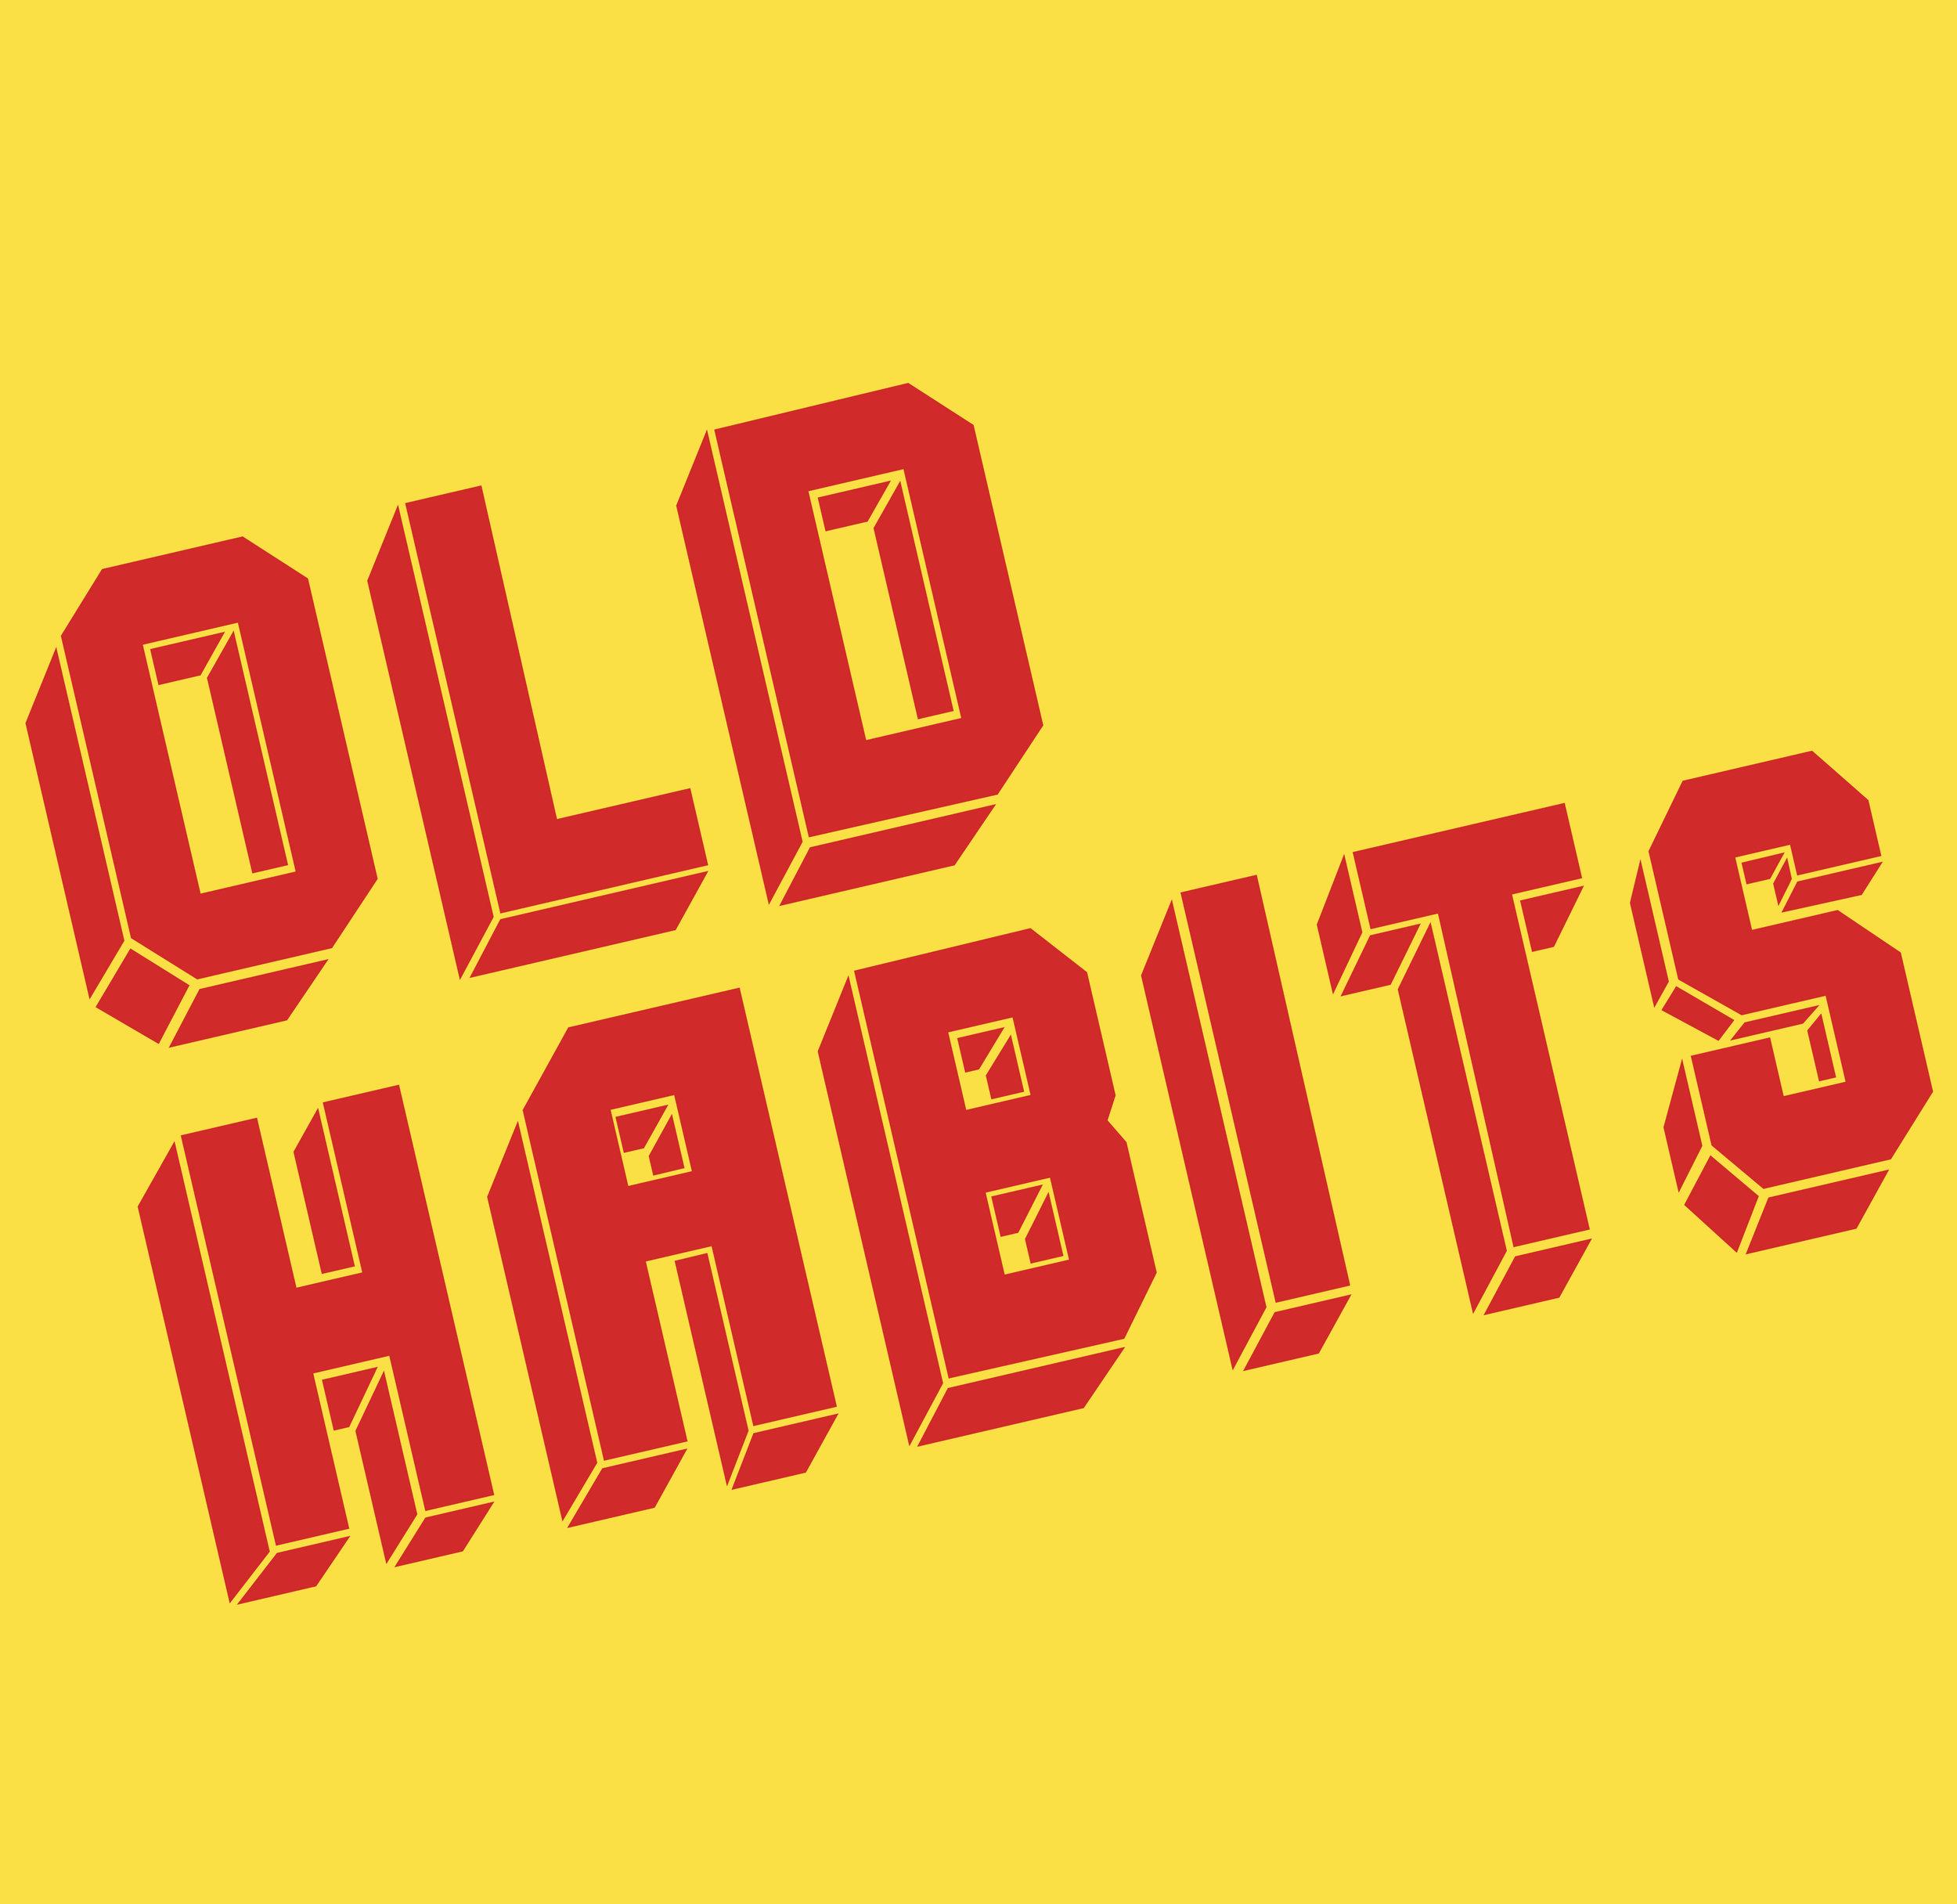 OldHabits_Logo_0118_FINAL-19.jpg